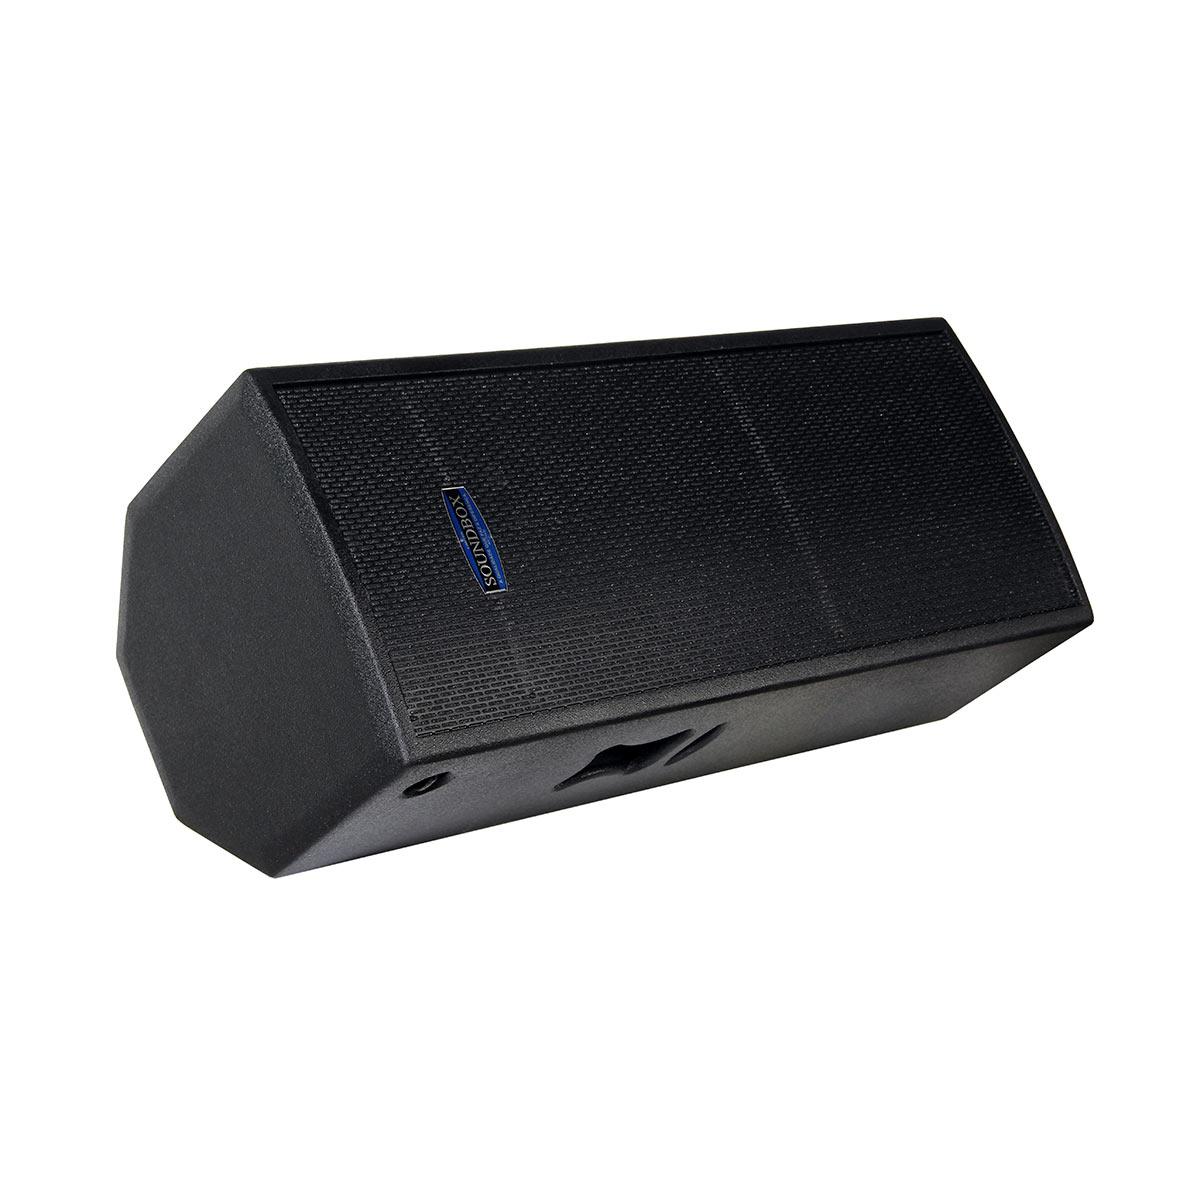 MS15 - Caixa Passiva 400W MS 15 Dupla Preta - SoundBox